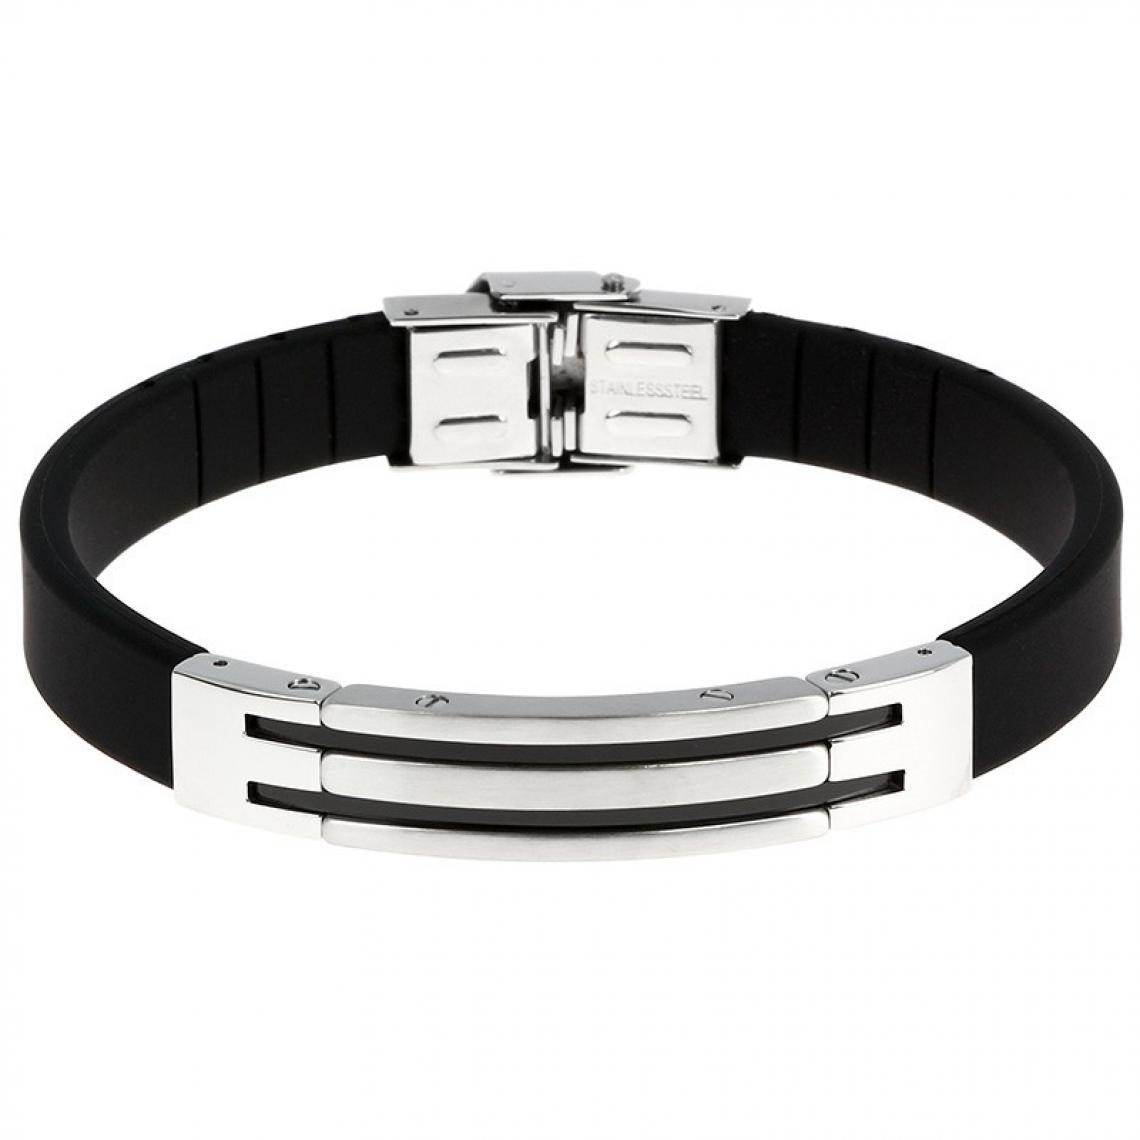 Bracelet LS1521-2/2 - LS1521-2-2 - Modalova